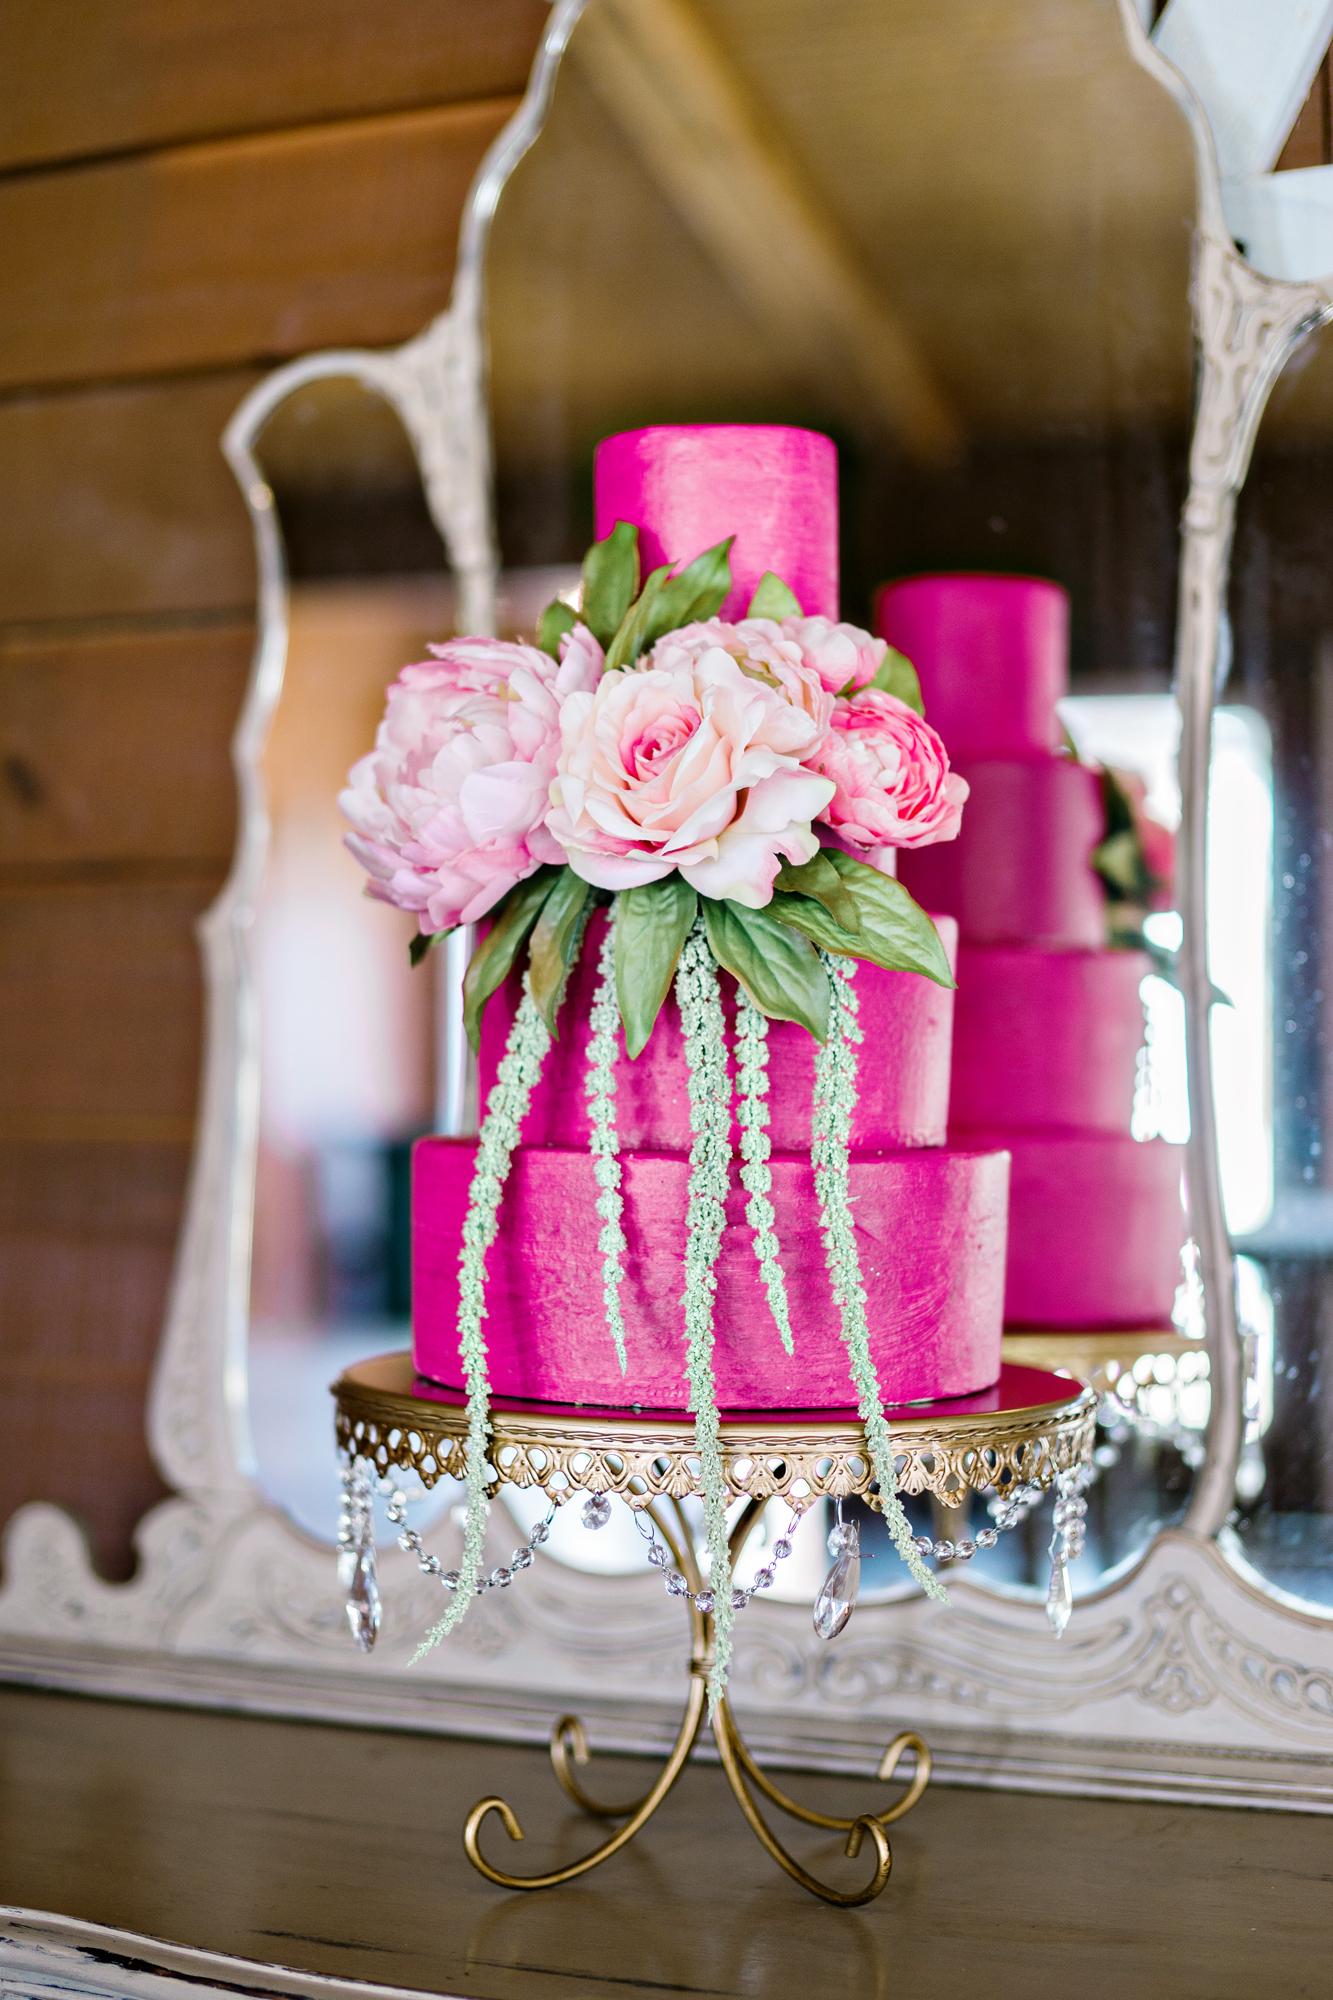 Opulent Treasures Cake Stands Andie Freeman Photo Pink Wedding Cake03.jpg